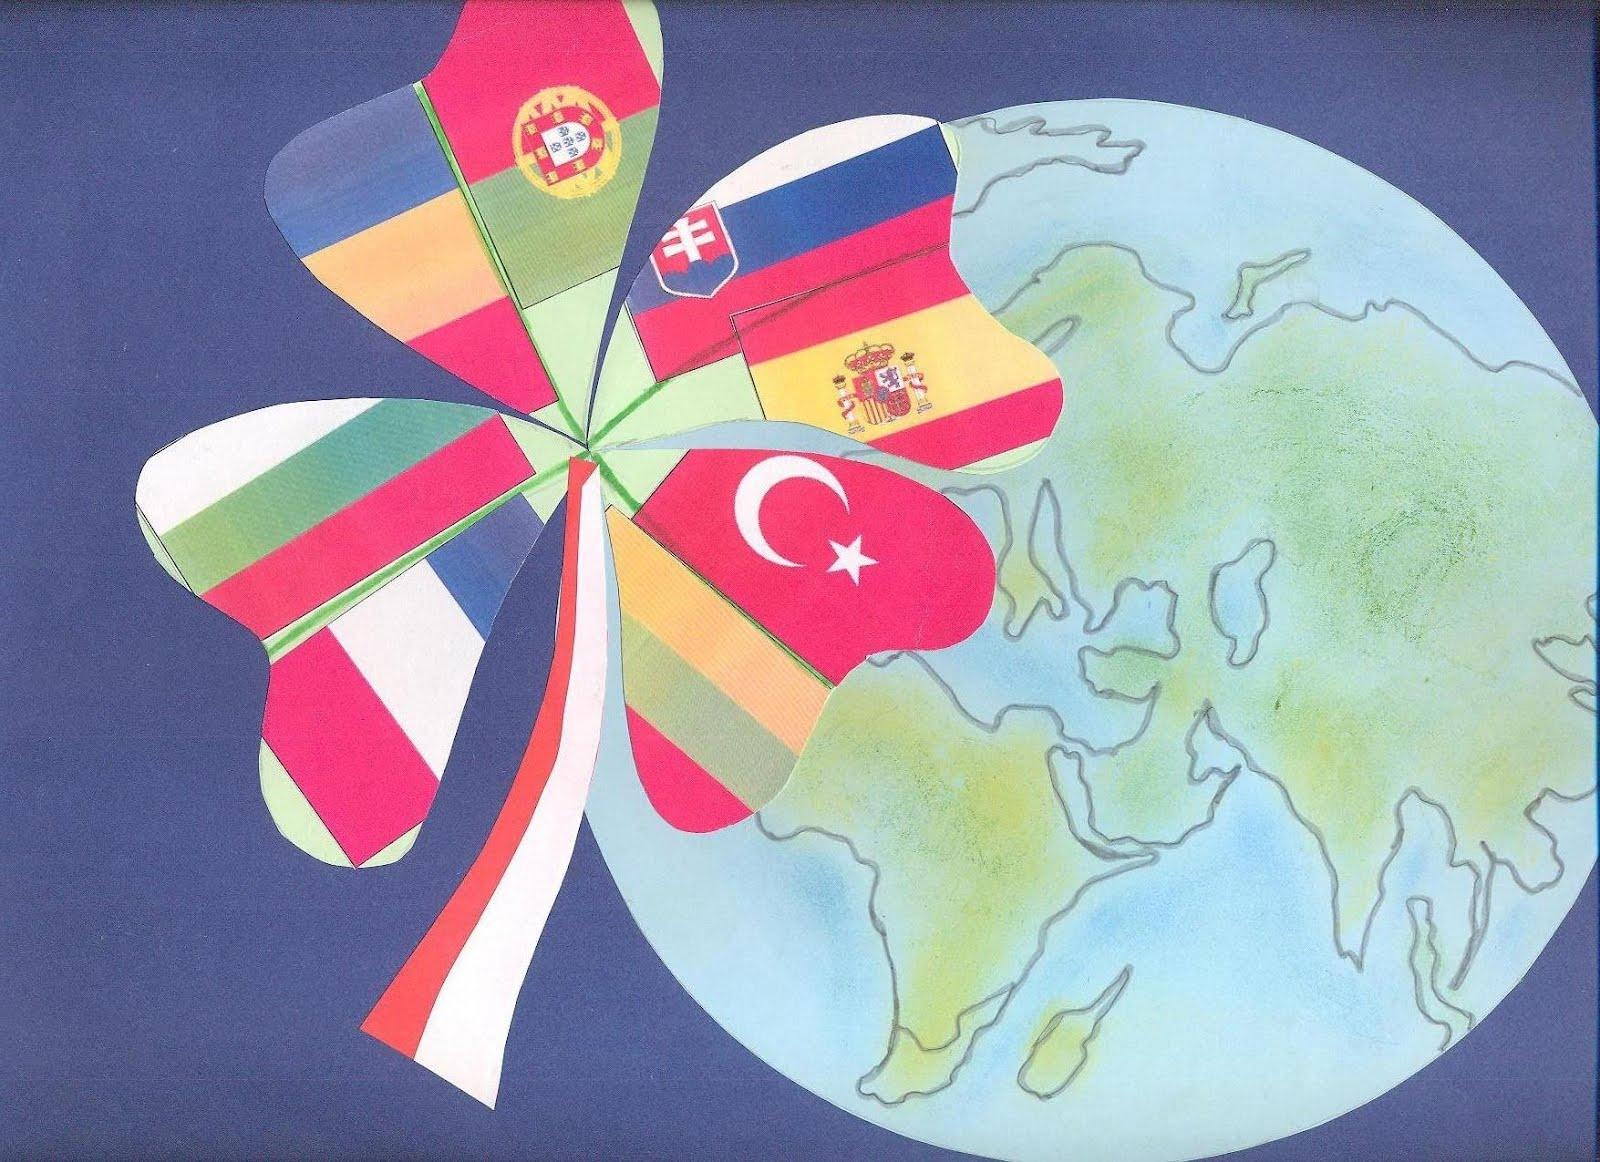 kacergine muslim This page is part of © fotw flags of the world website k list of keywords beginning with k last modified: 2017-07-29 keywords: web   index   keywords   links: fotw homepage   se.